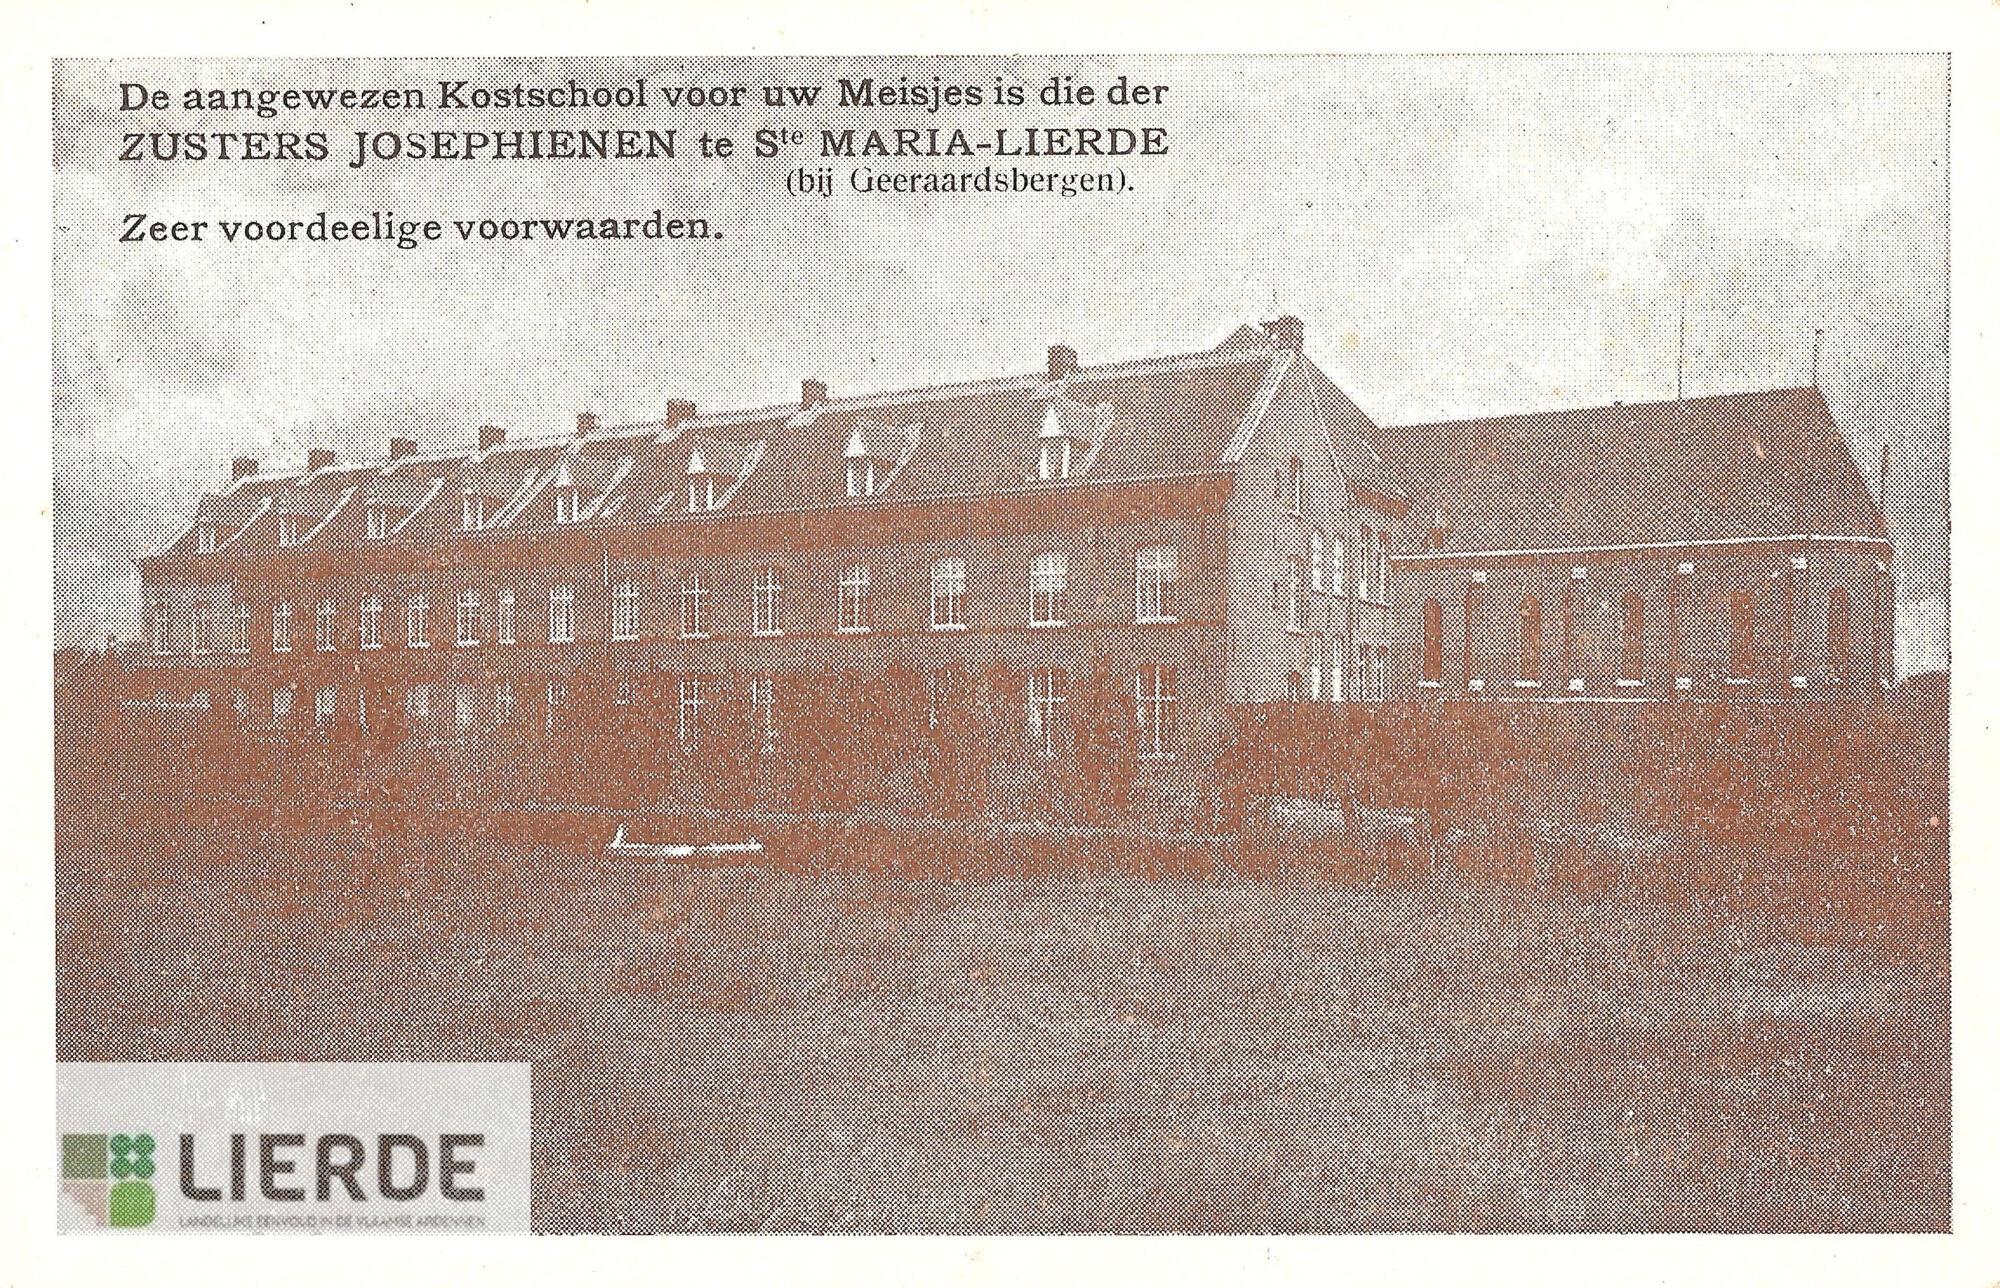 Klooster/kostschool Sint-Maria-Lierde